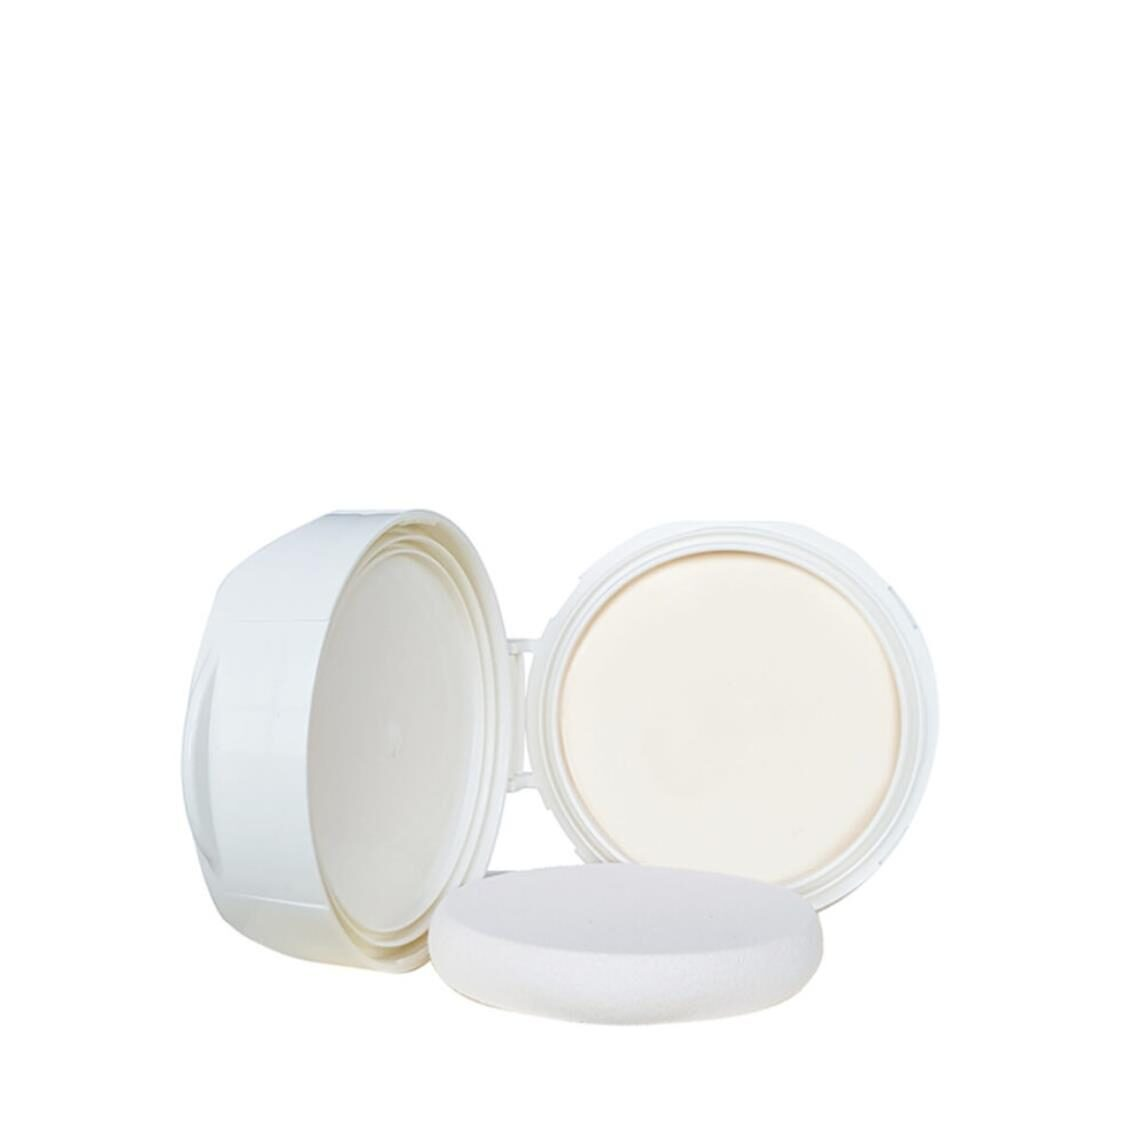 Anessa Perfect UV Sunscreen Base Make Up Refill 10g